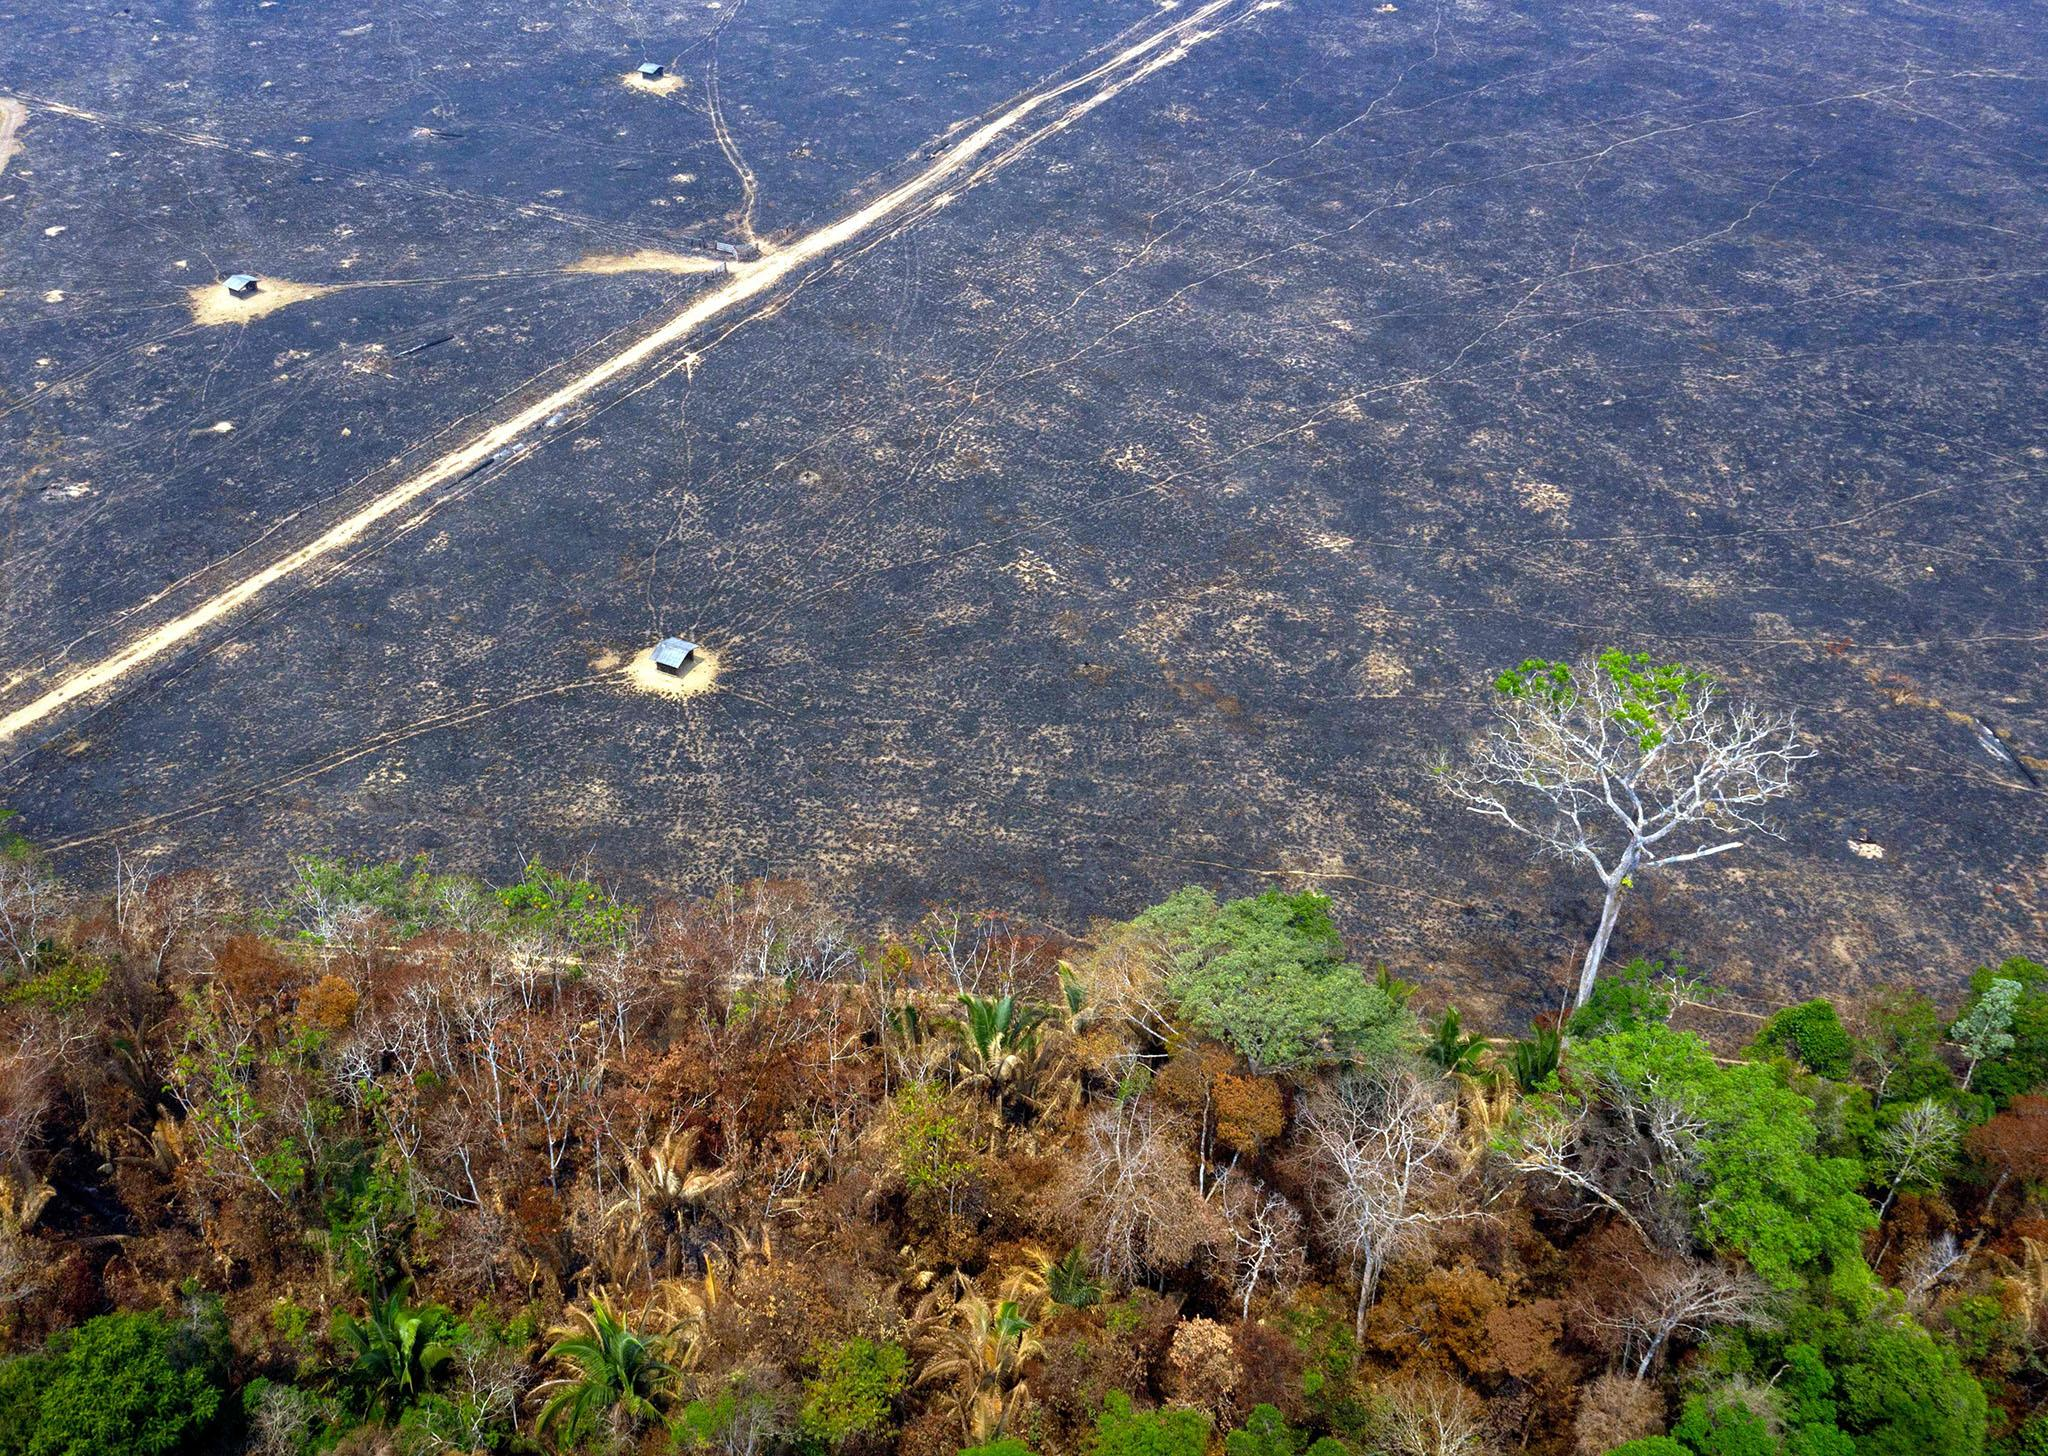 Amazon Rainforest Fires Melting Glaciers More Than 1 250 Miles